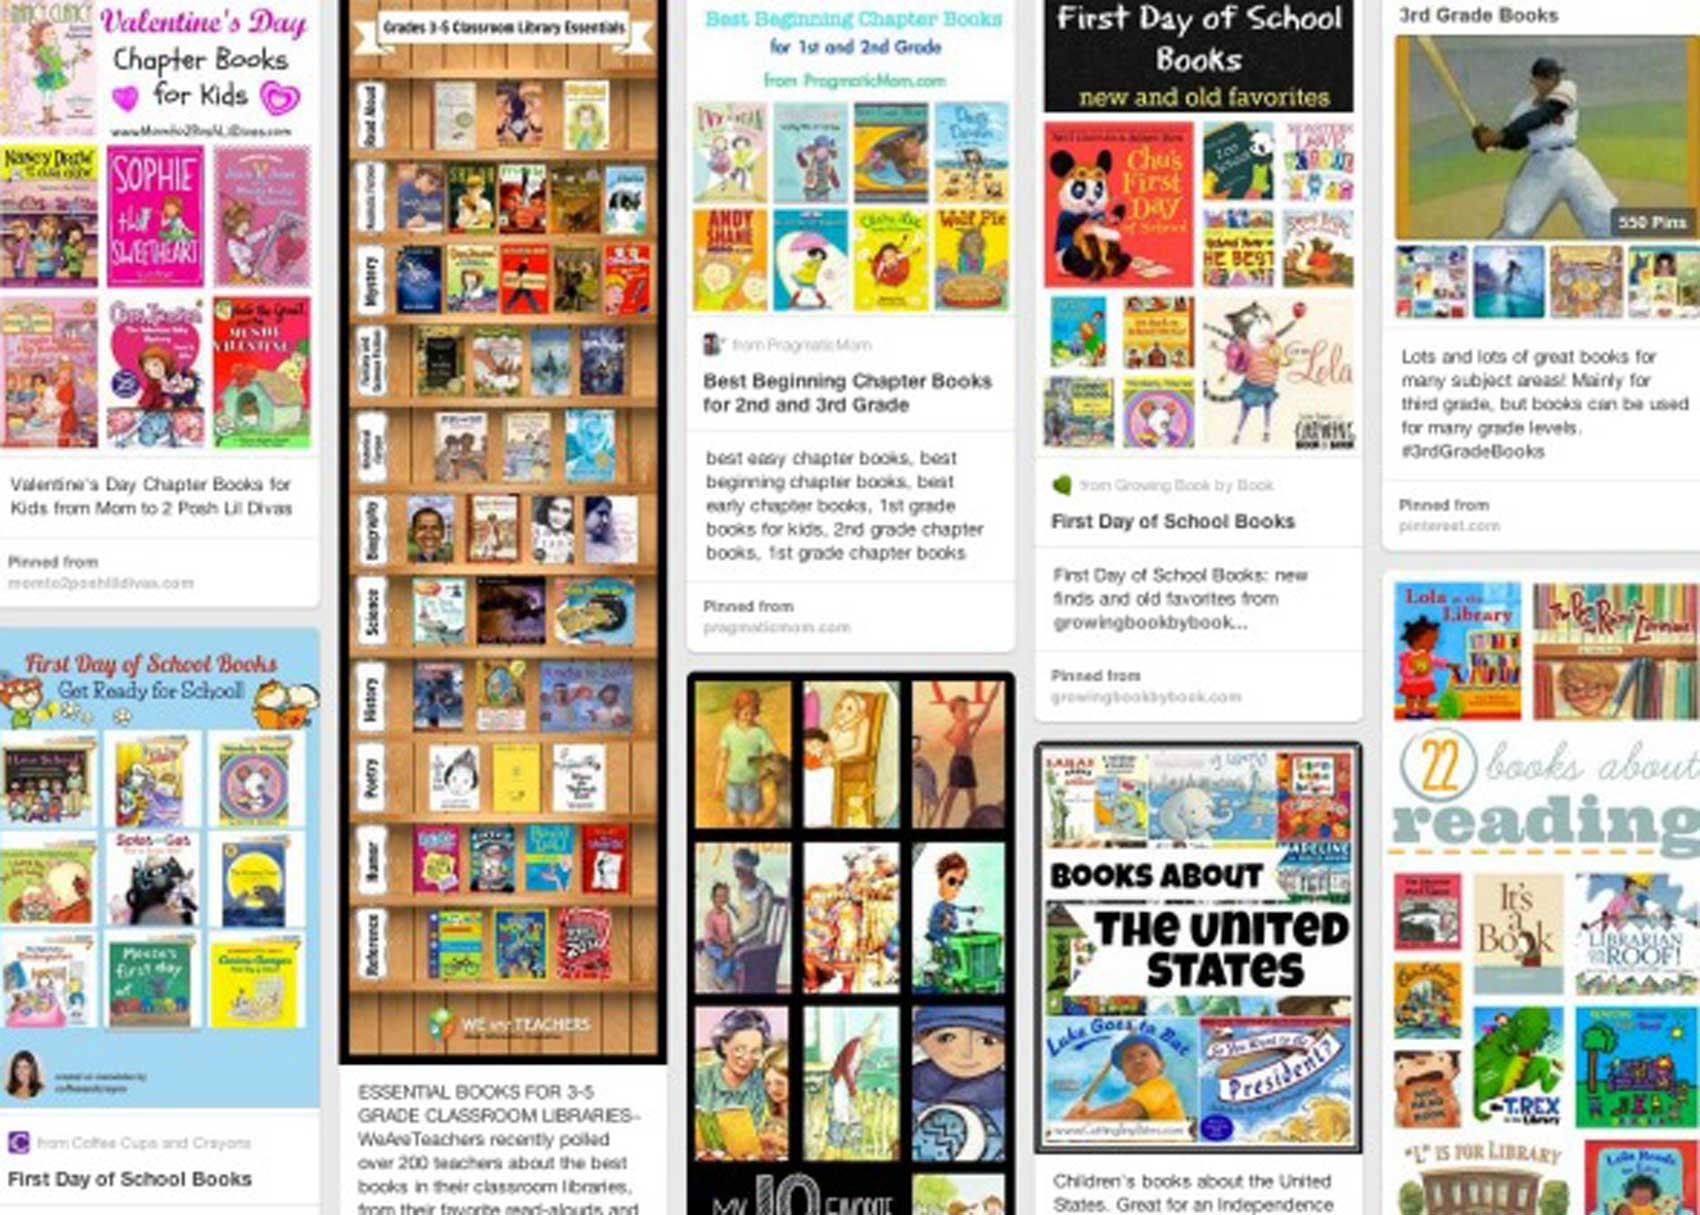 206 Best Nooks Images On Pinterest: Best Pinterest Boards For Children's Books And Reading